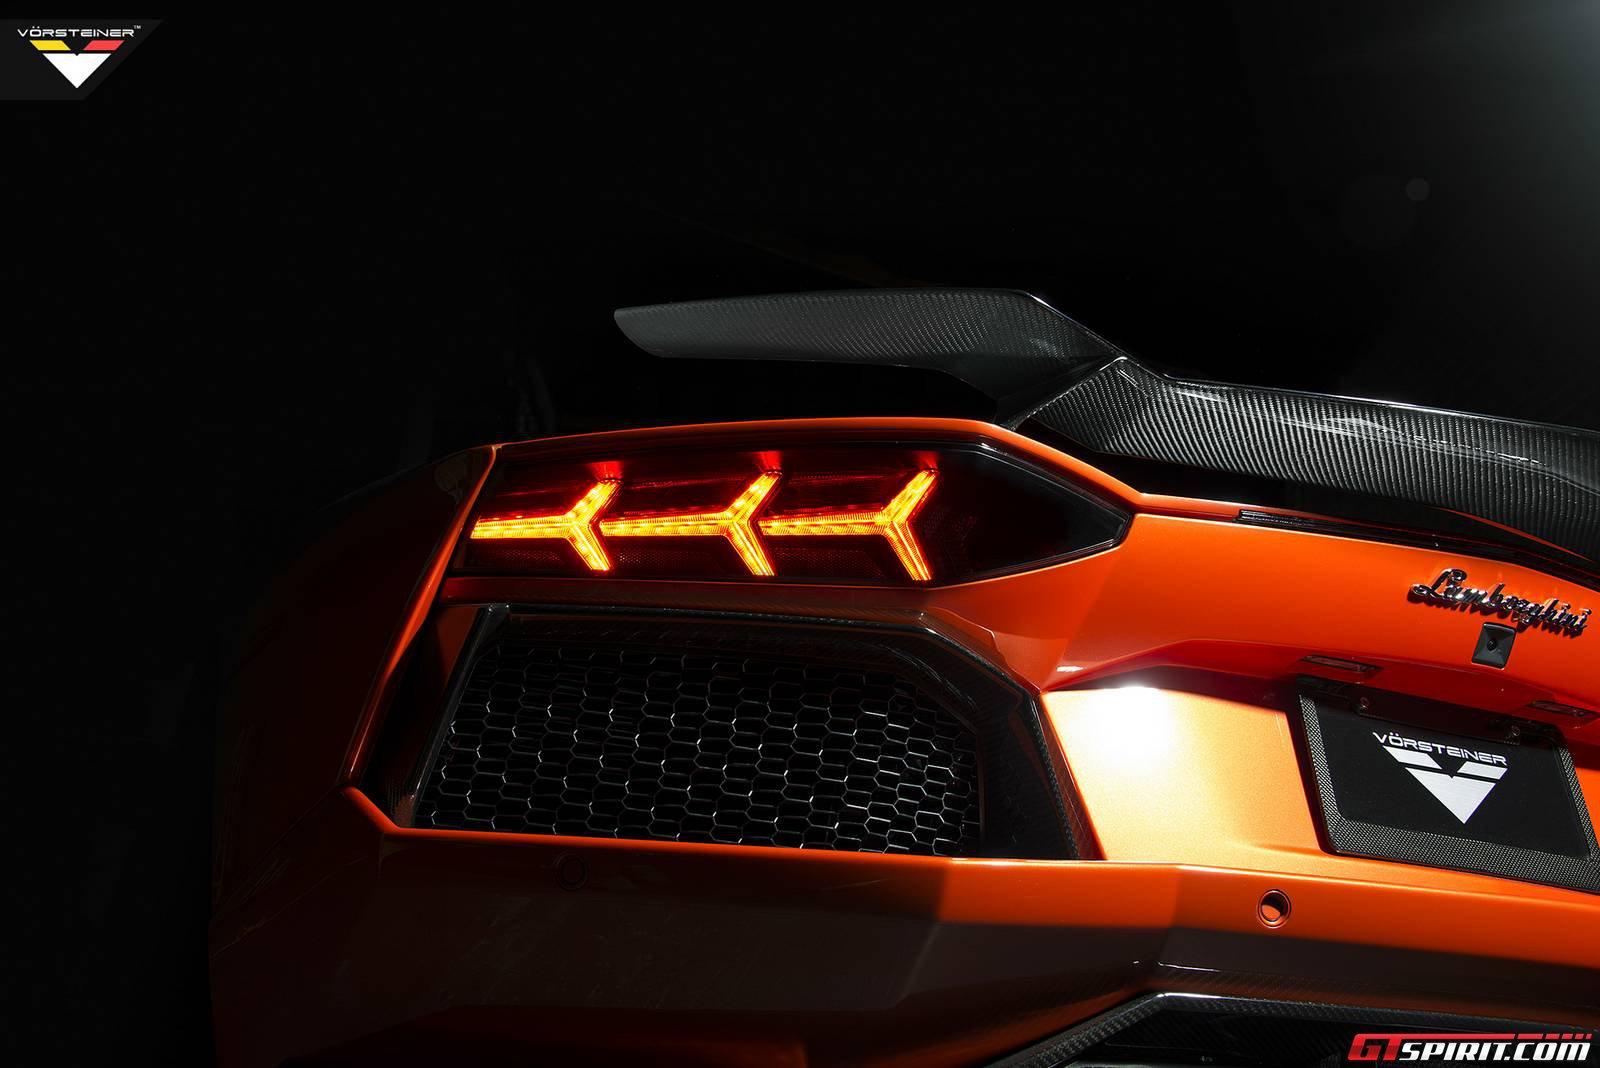 Car Wallpapers Hd 1920x1080 Mclaren P1 Vorsteiner Lamborghini Aventador V Lp 740 Photoshoot